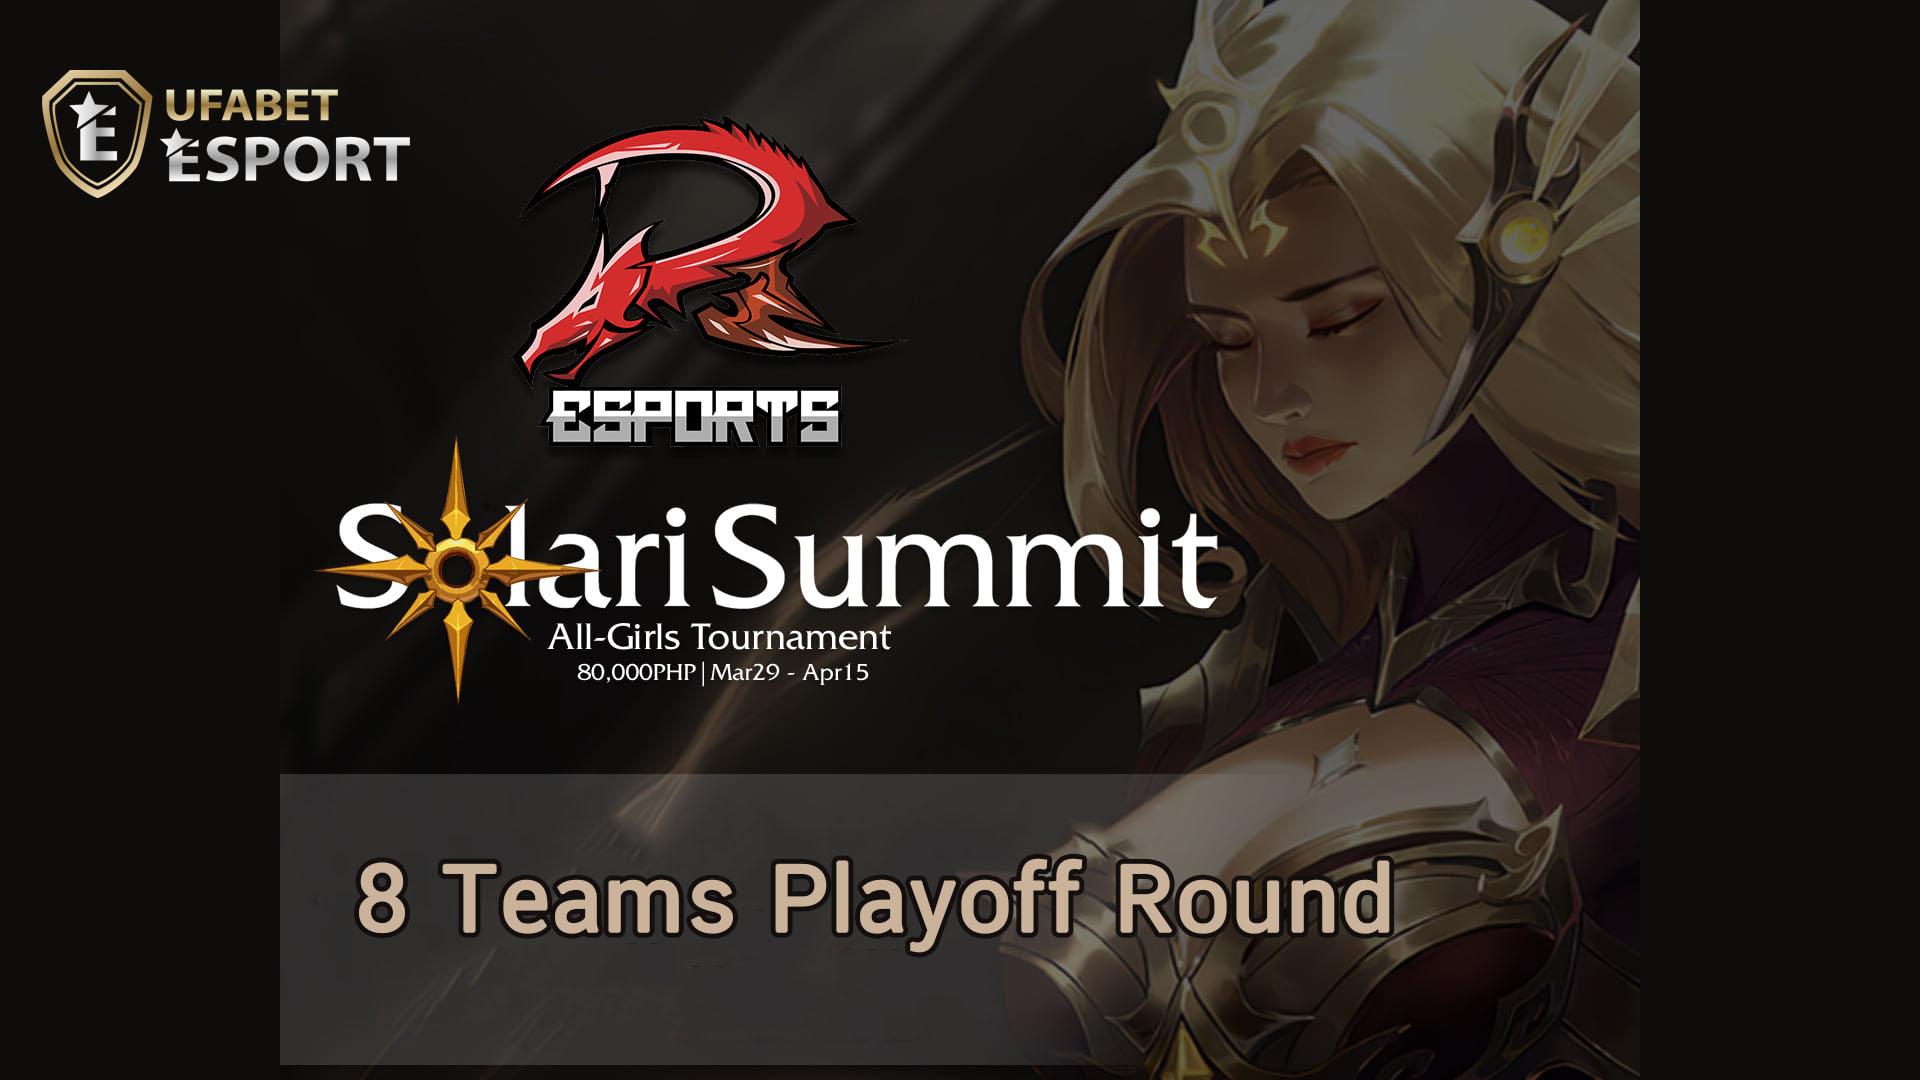 Solari Summit